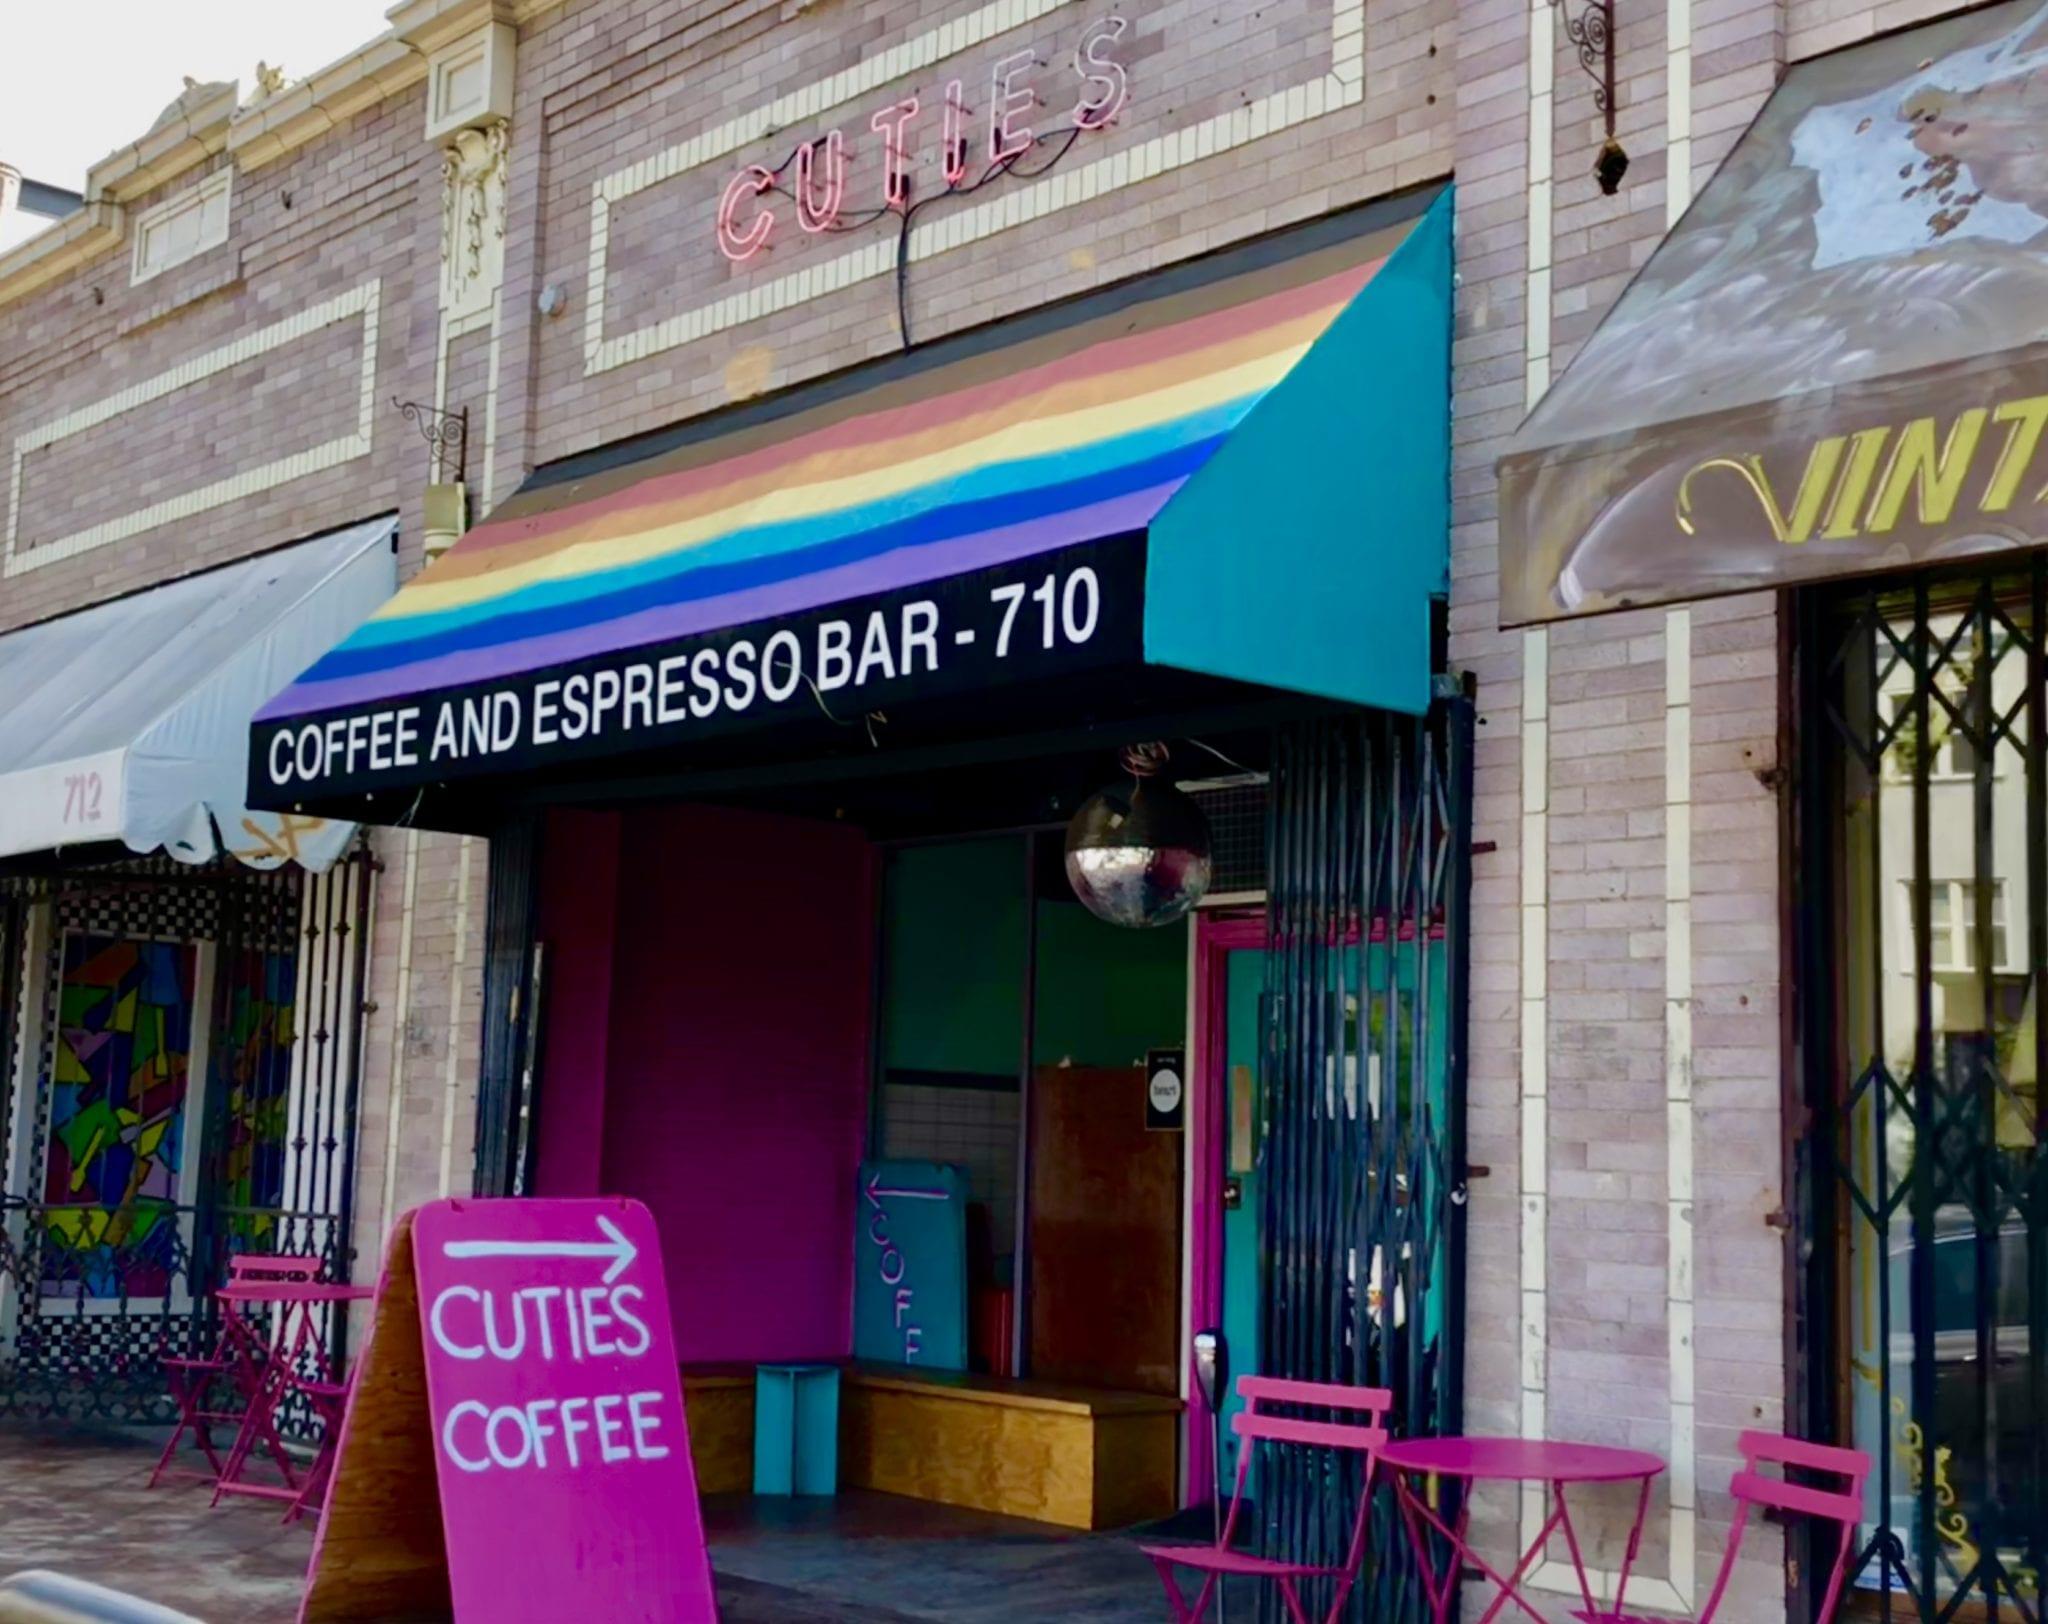 Photo provided by Cutie's Coffee, LA